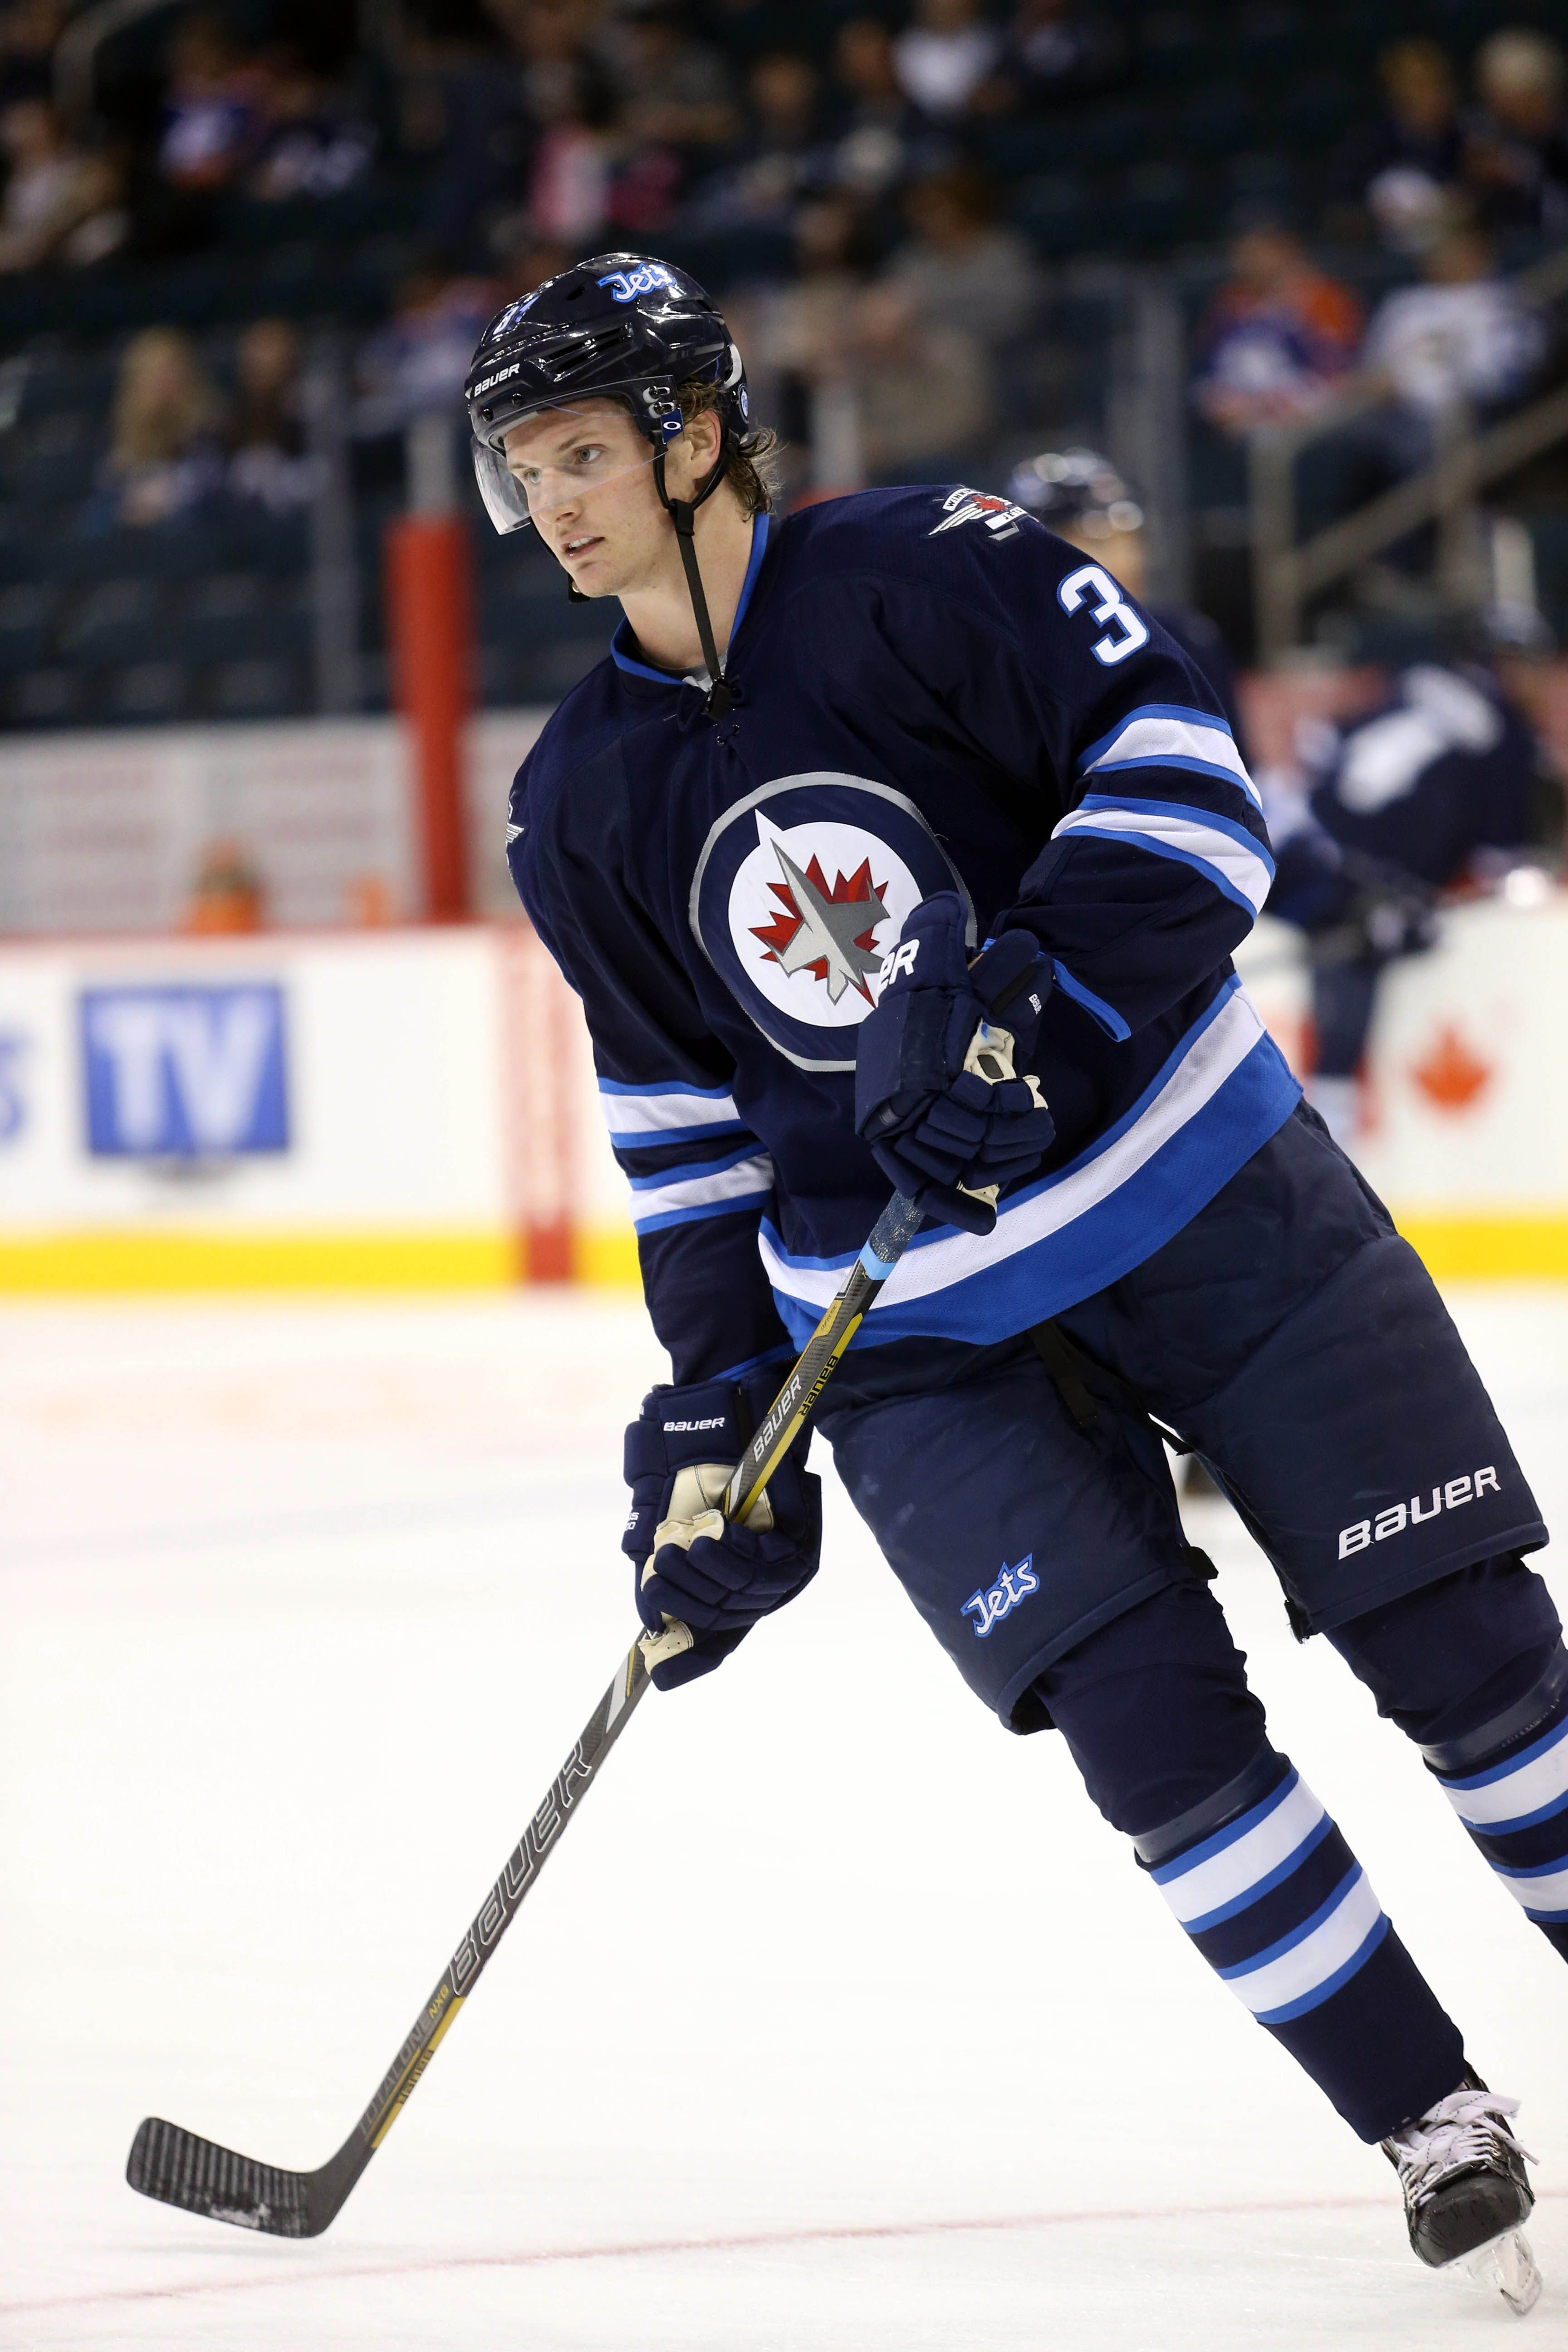 CrowdCam Hot Shot Winnipeg Jets defenseman Jacob Trouba